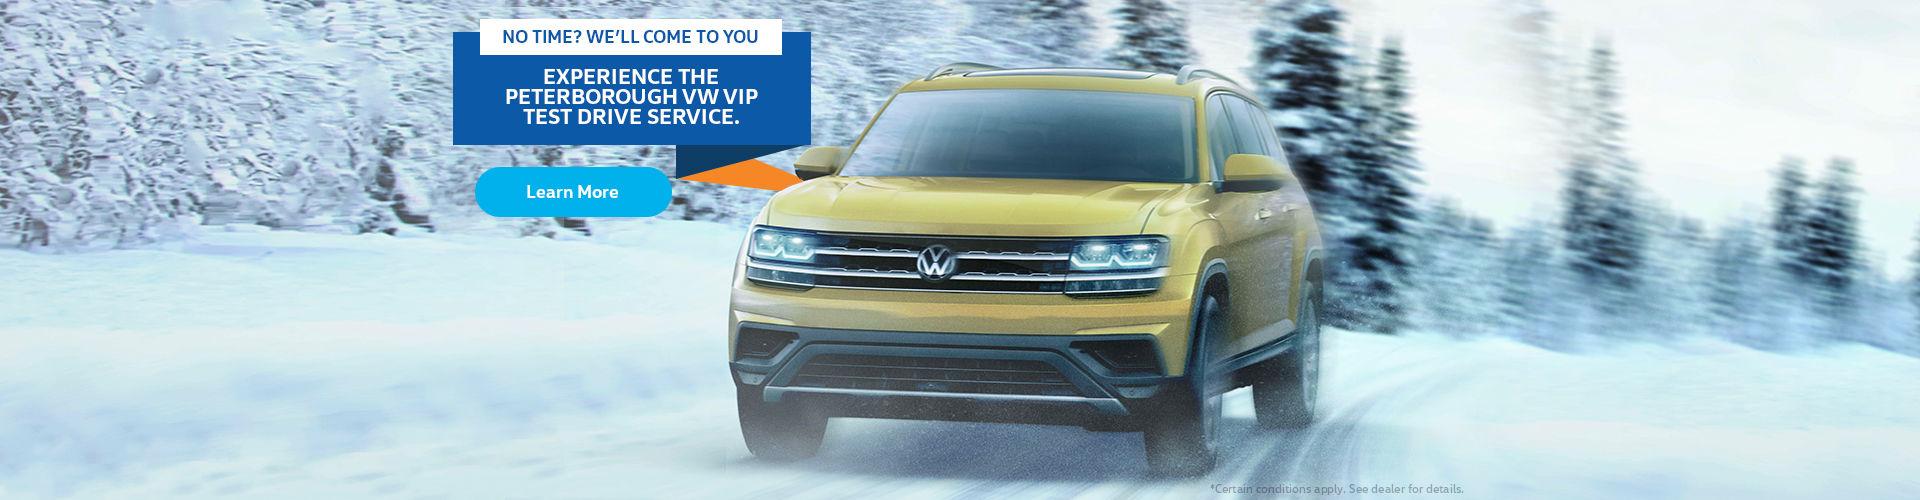 VIP Test Drive Service